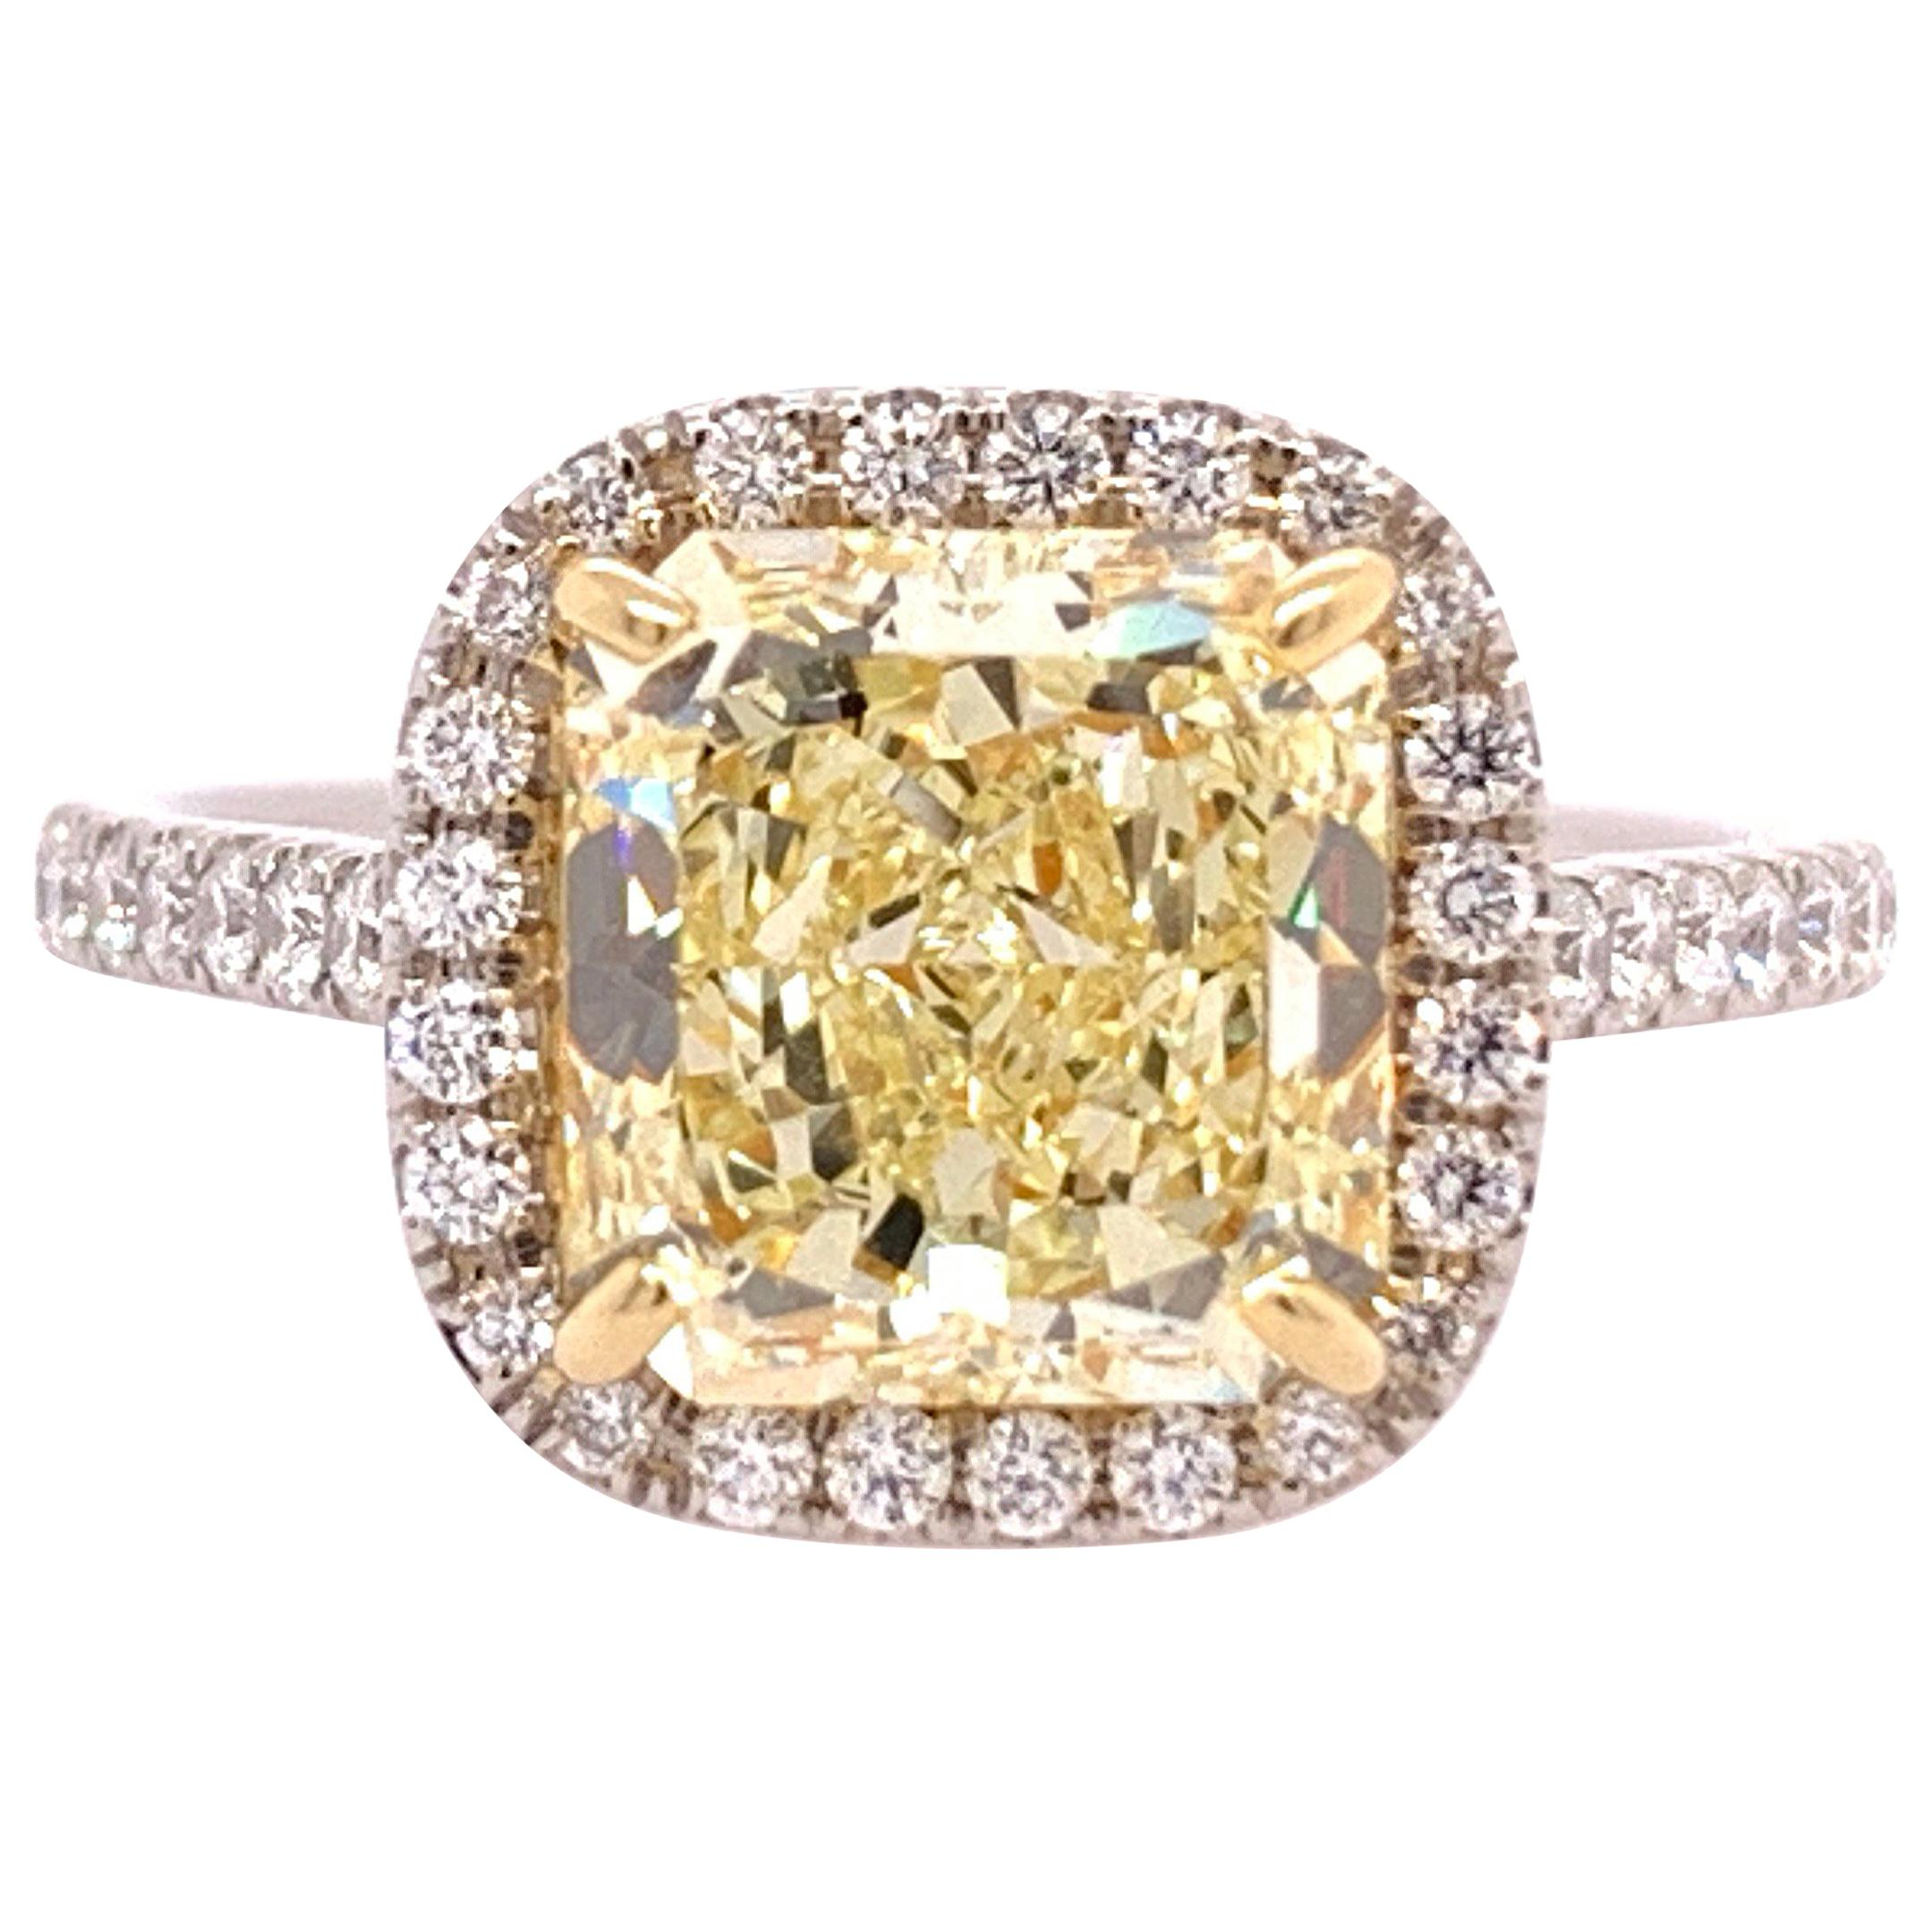 Platinum Ring 2.64 Carat GIA Certified Natural Radiant Fancy Yellow VVS Diamond